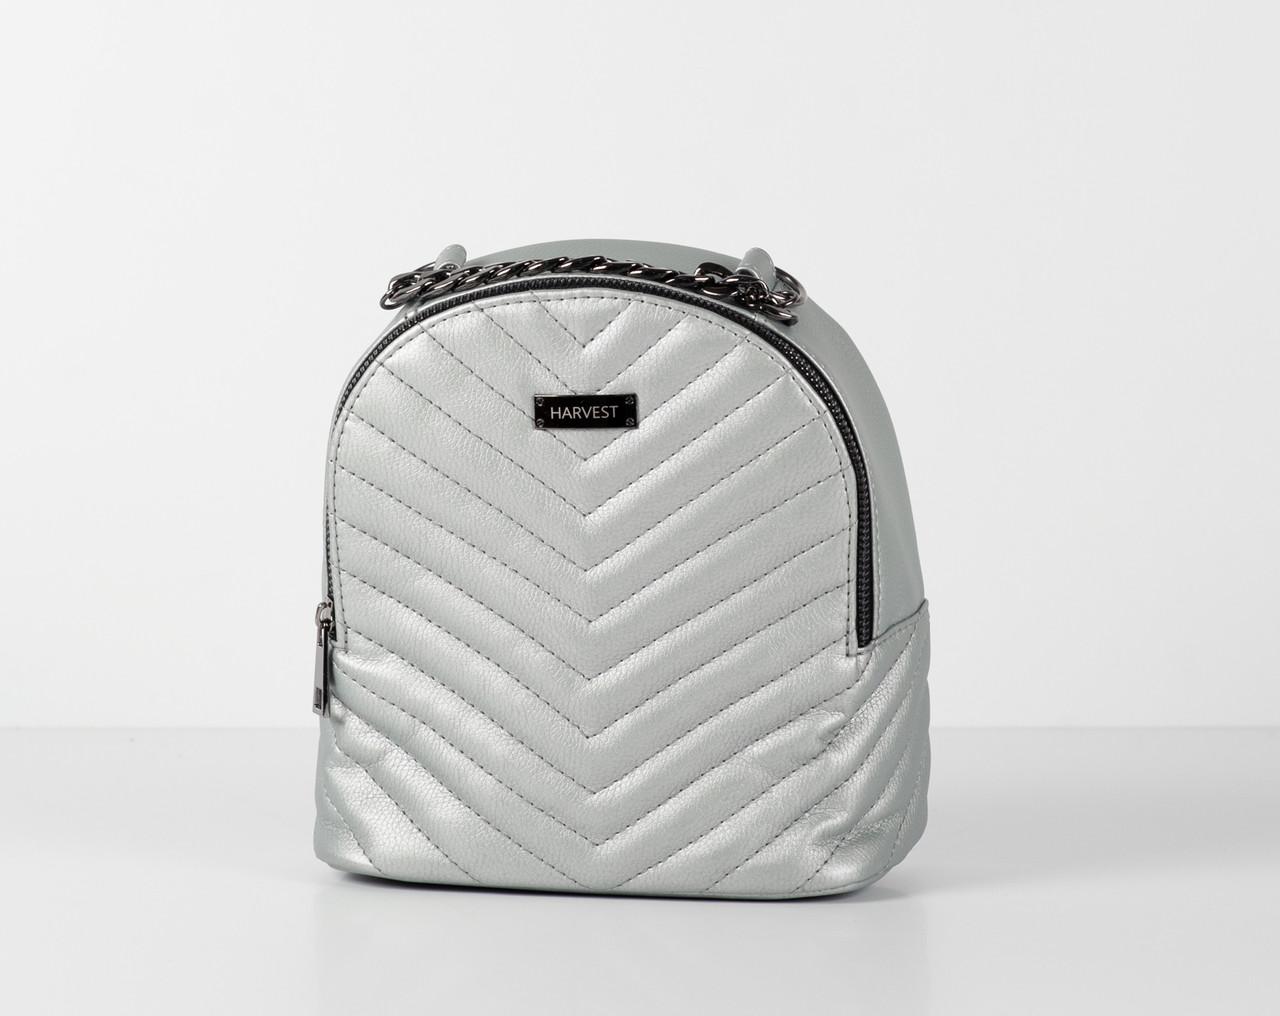 4296e03b3e96 Женский рюкзак сумка серебристый эко-кожа HARVEST (женский рюкзак, сумка  женская, сумка